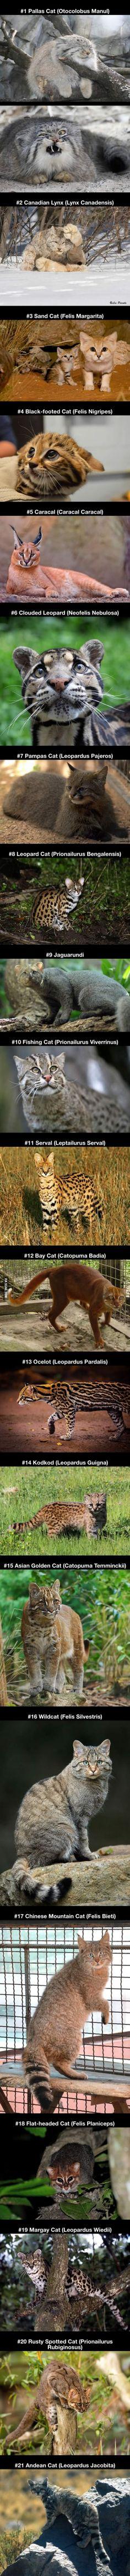 21 Rare Wild Cat Species You Probably Didn't Know Exist  visit us https://pw-surplus.myshopify.com#tricks#amazinganimals